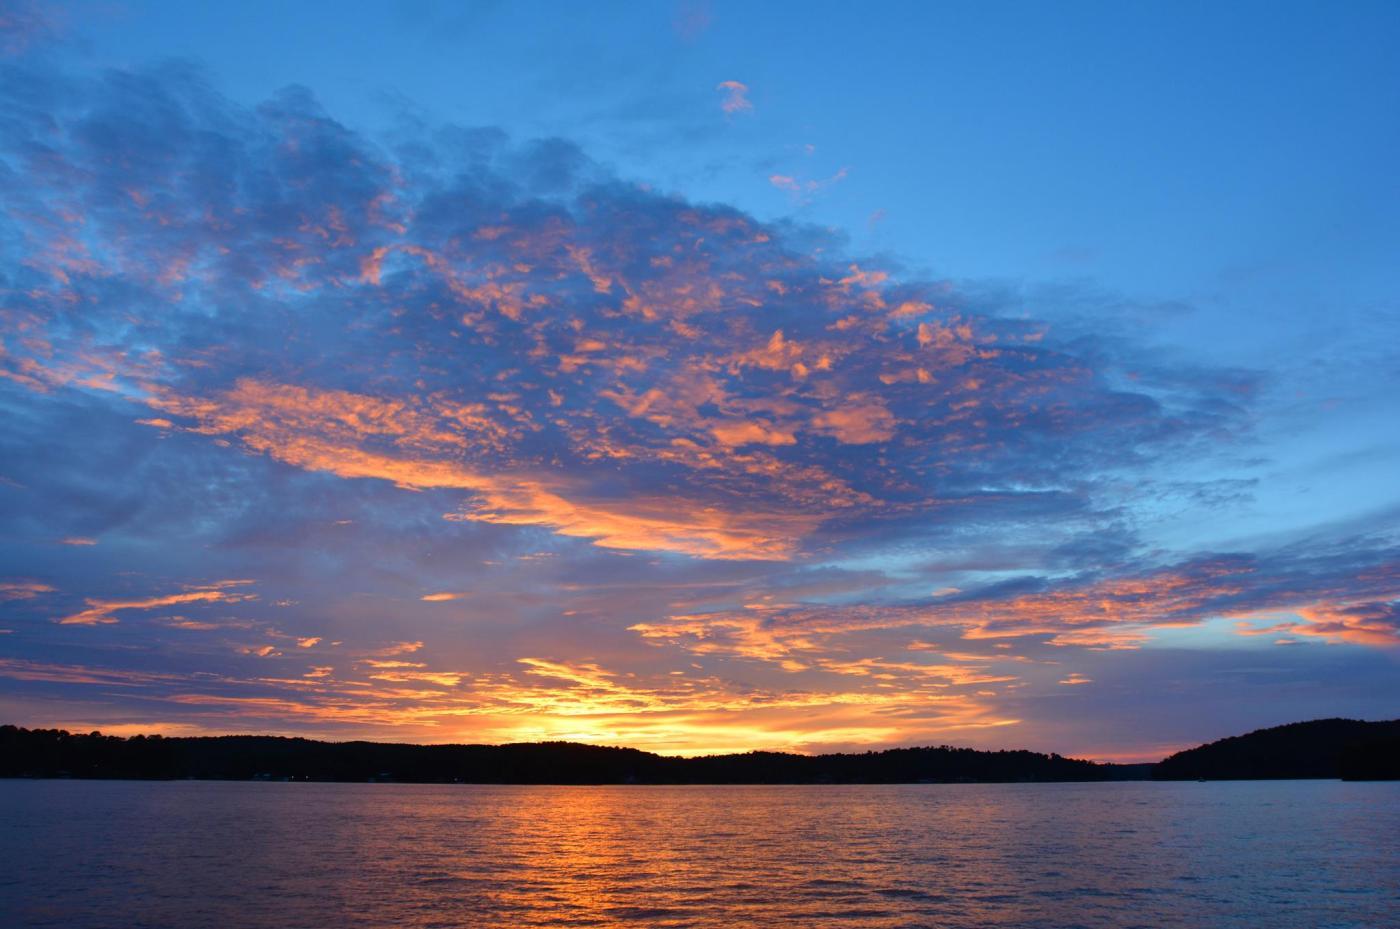 Sunsetting On Lake Martin